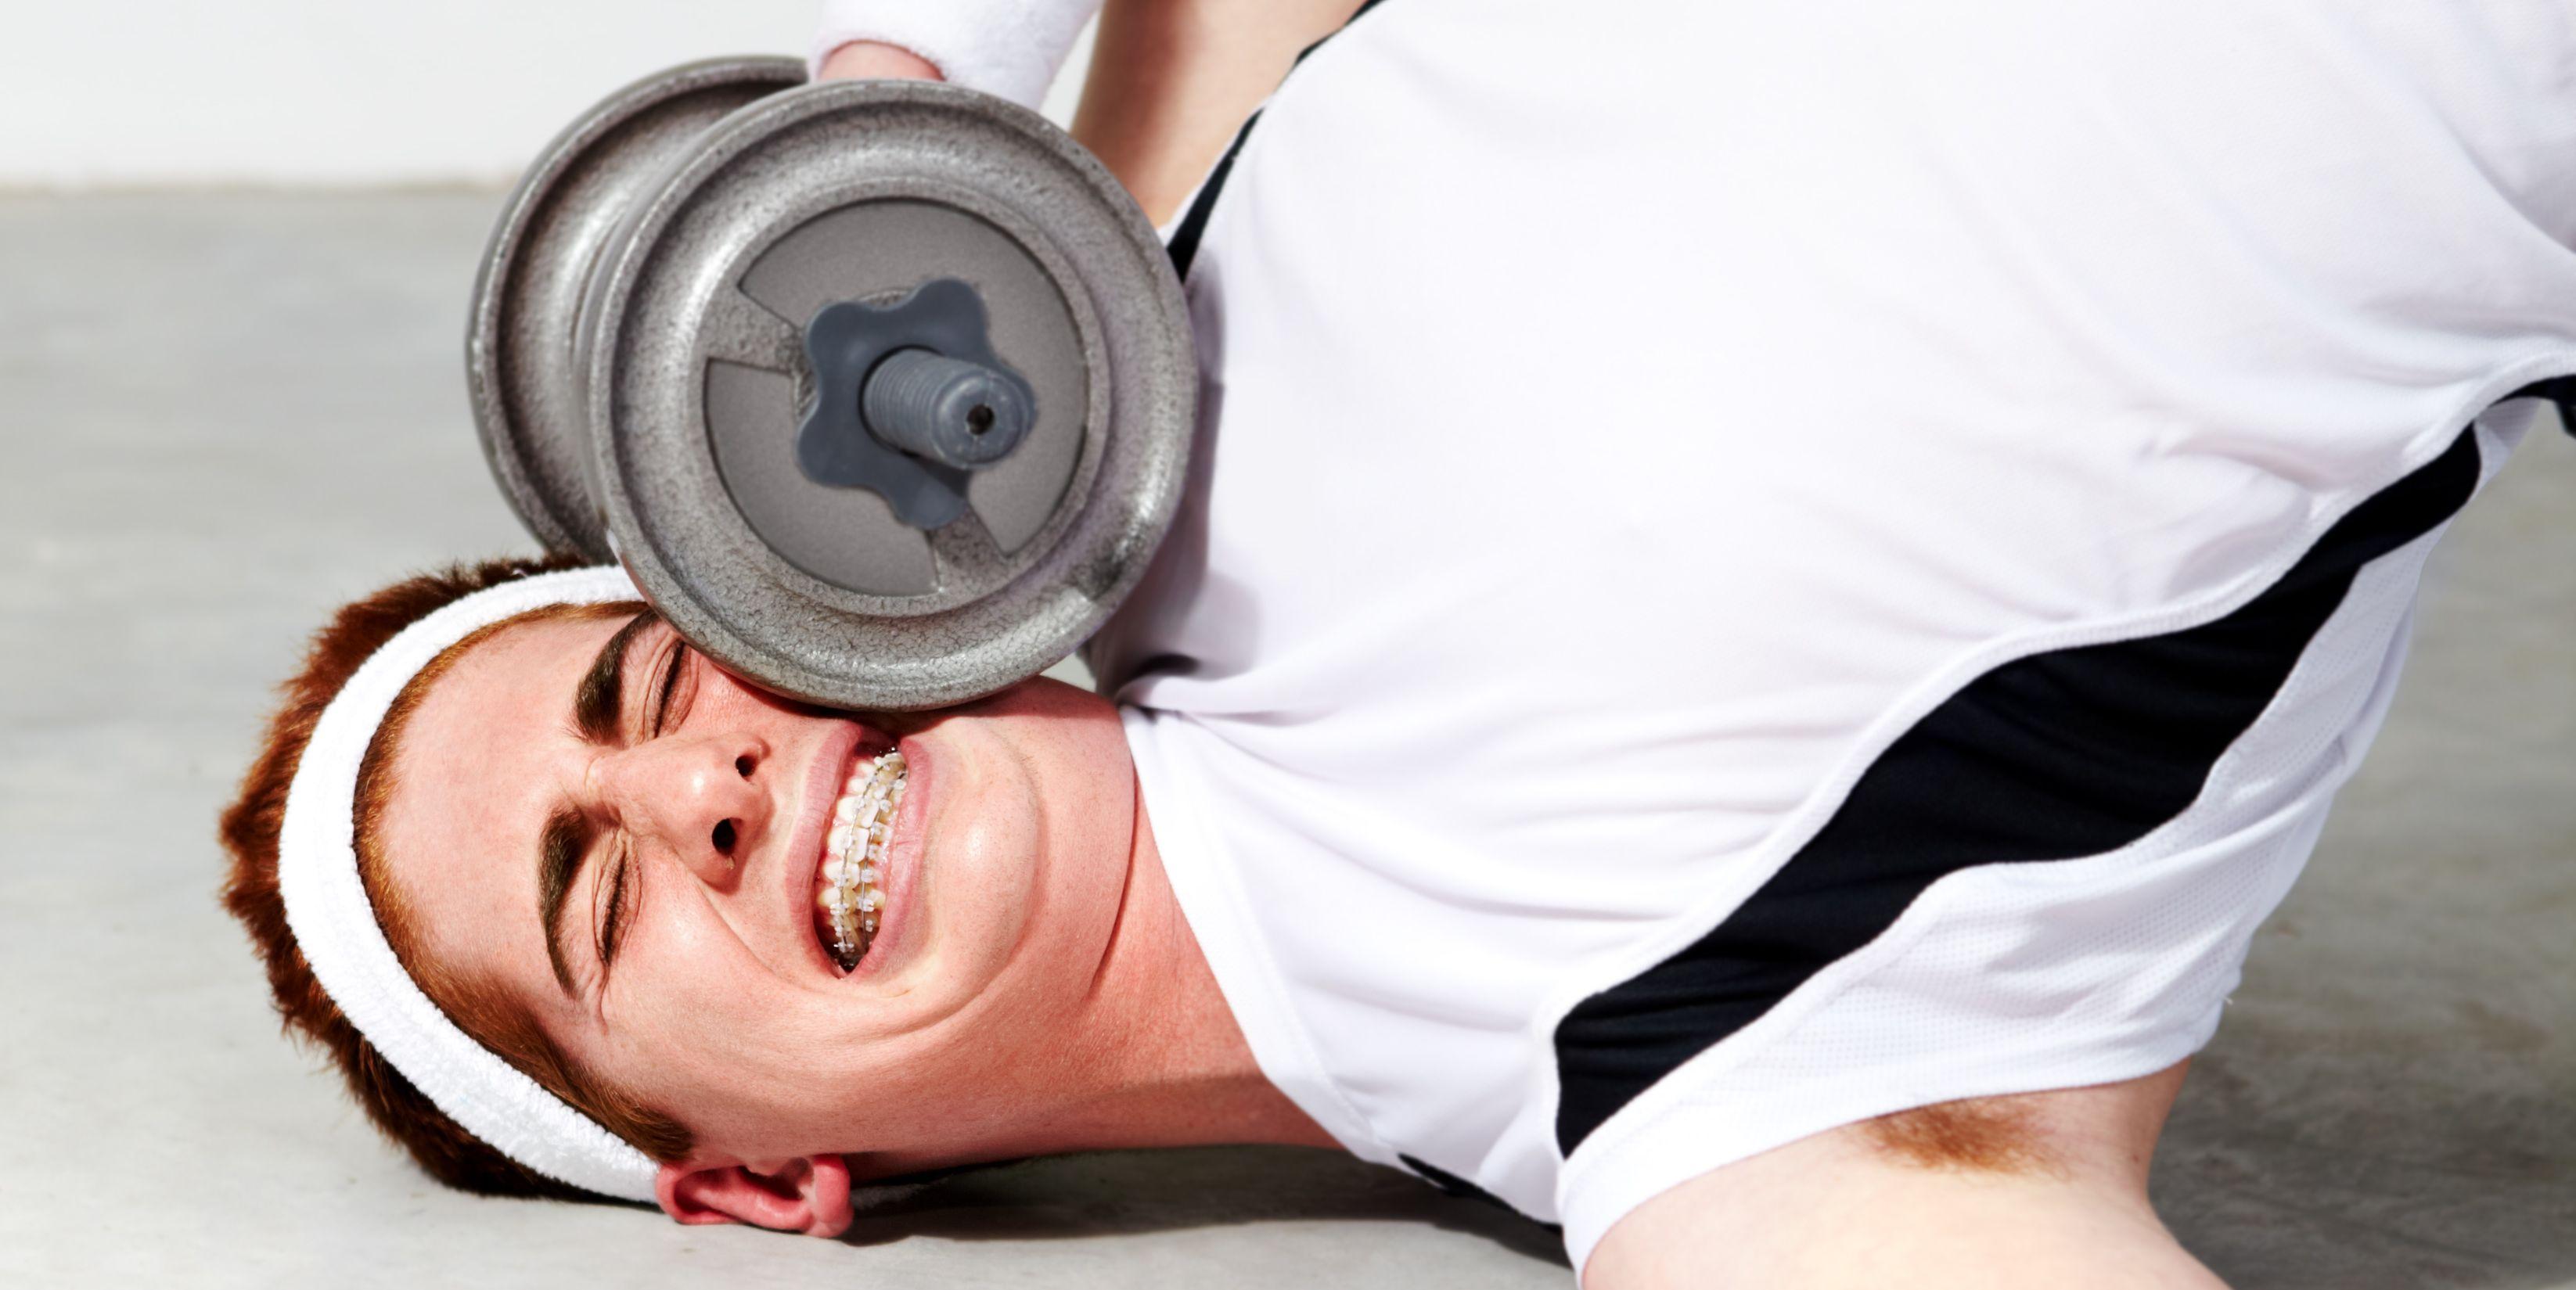 golpes graciosos gimnasio,caidasgraciosas gimnasio, accidentes graciosos gimnasio, vídeos graciosos gimnasio